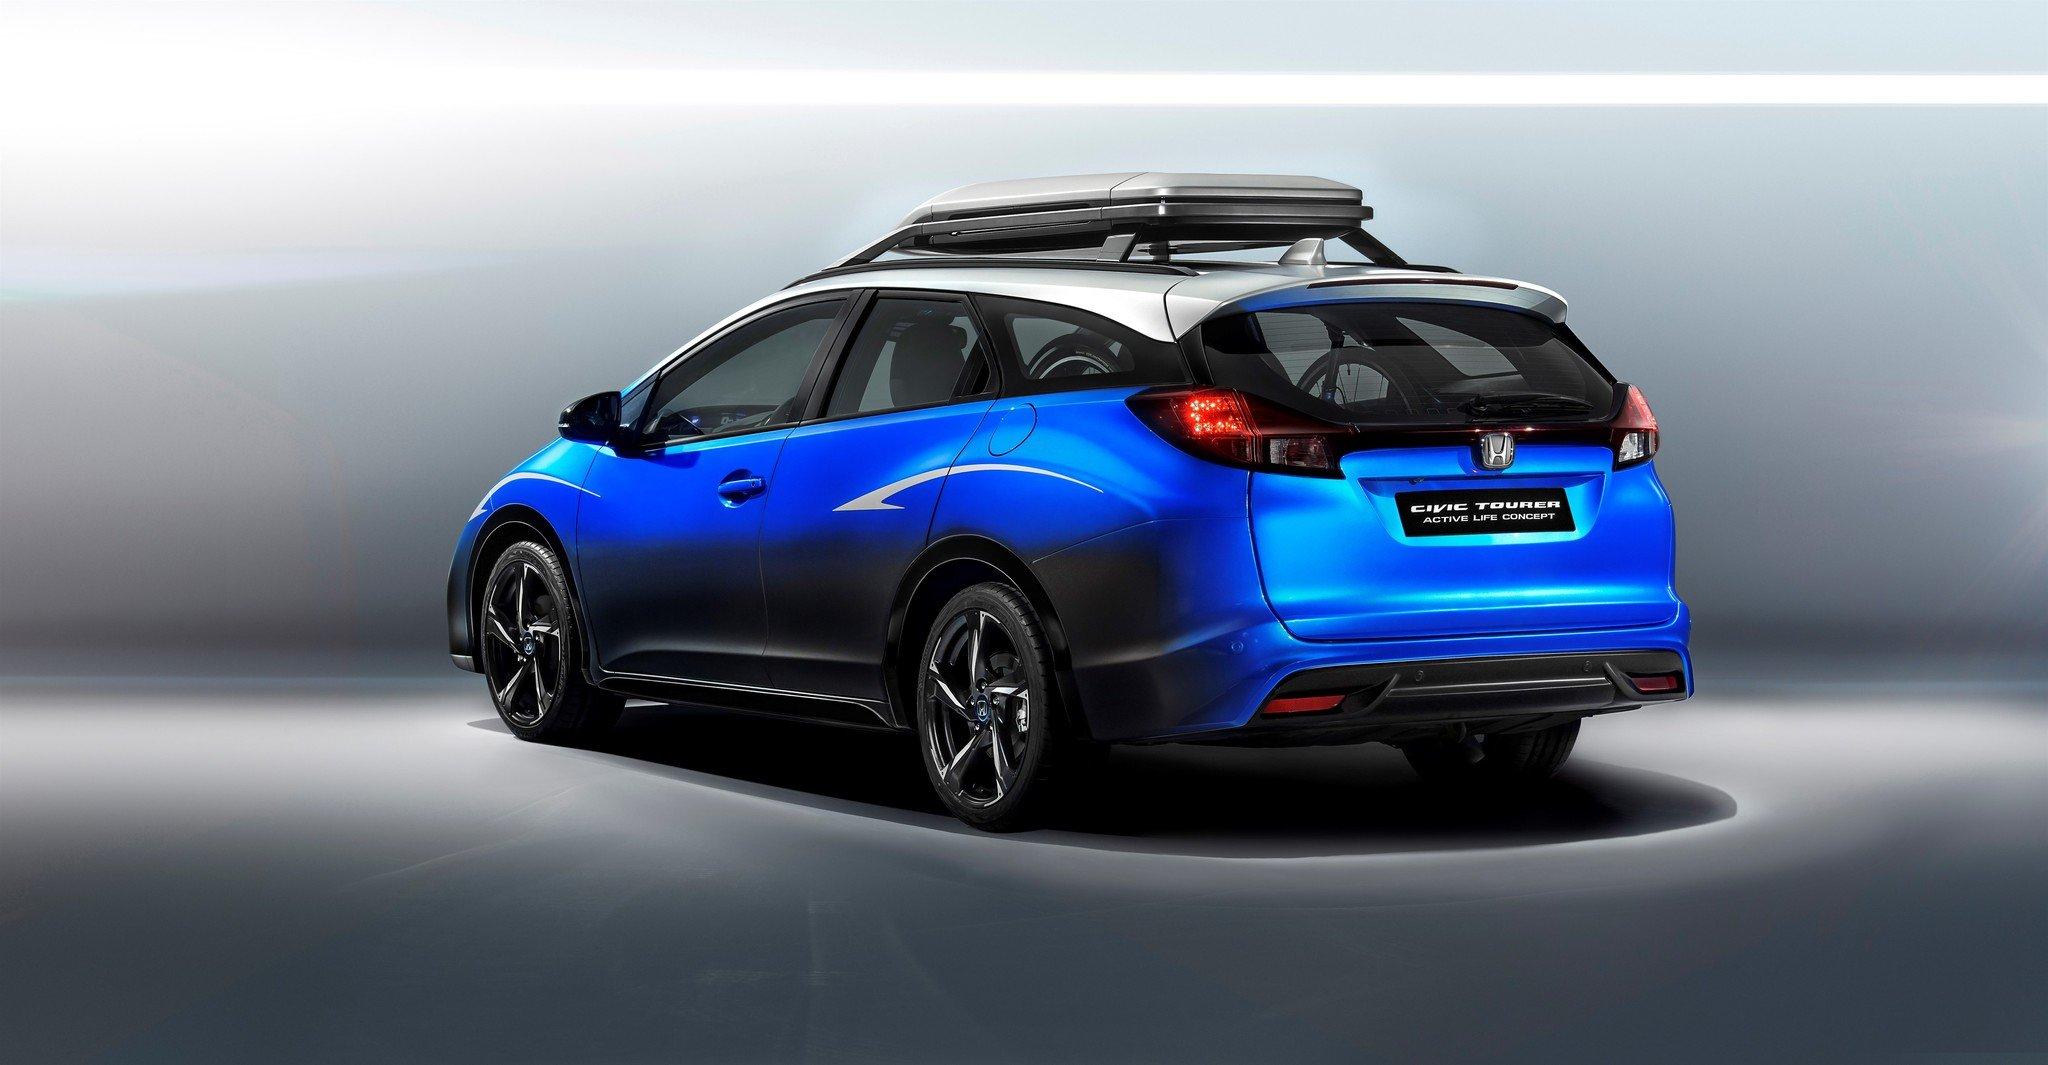 Honda Civic Tourer Active Life Concept 2015 02